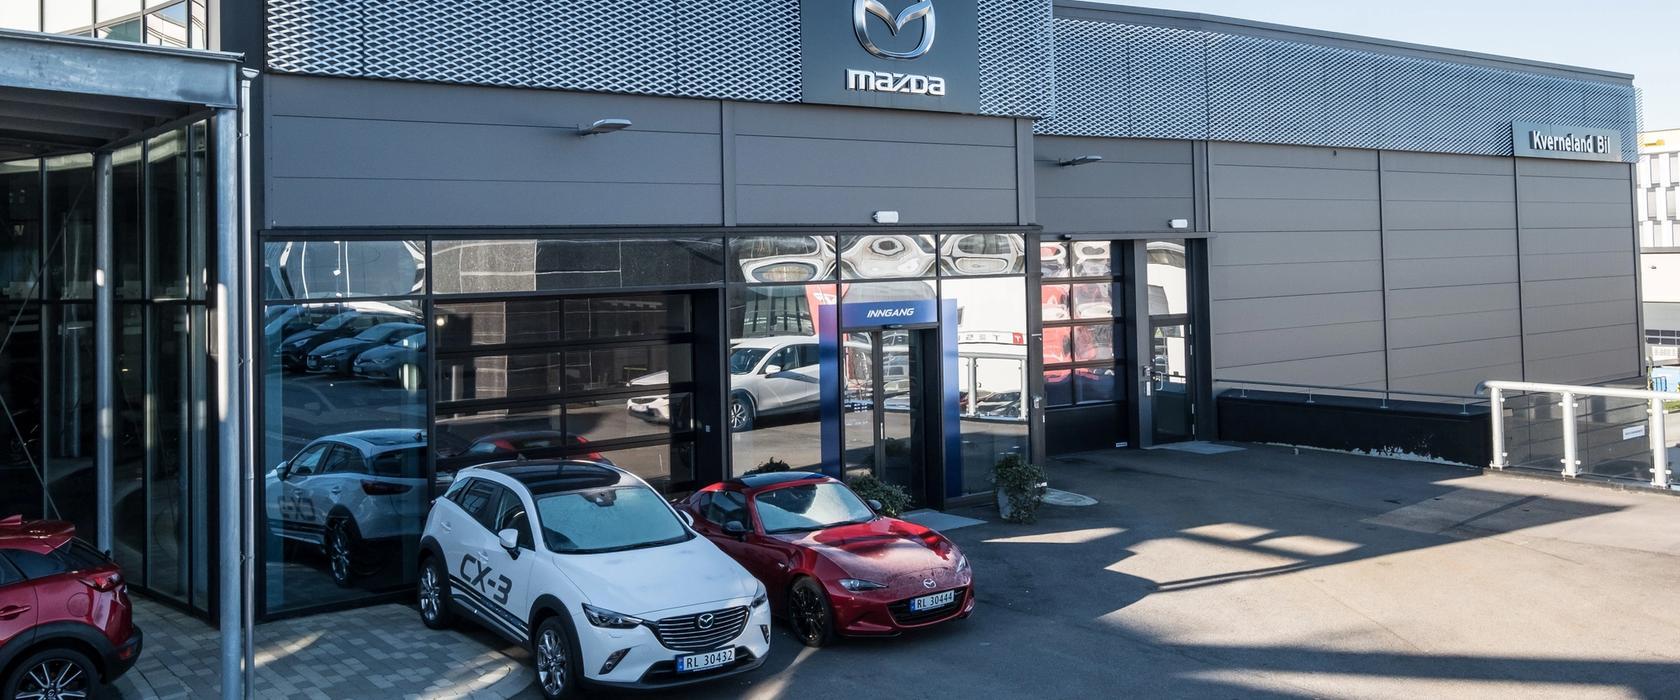 Inngangspartiet på Mazda Bilhuset